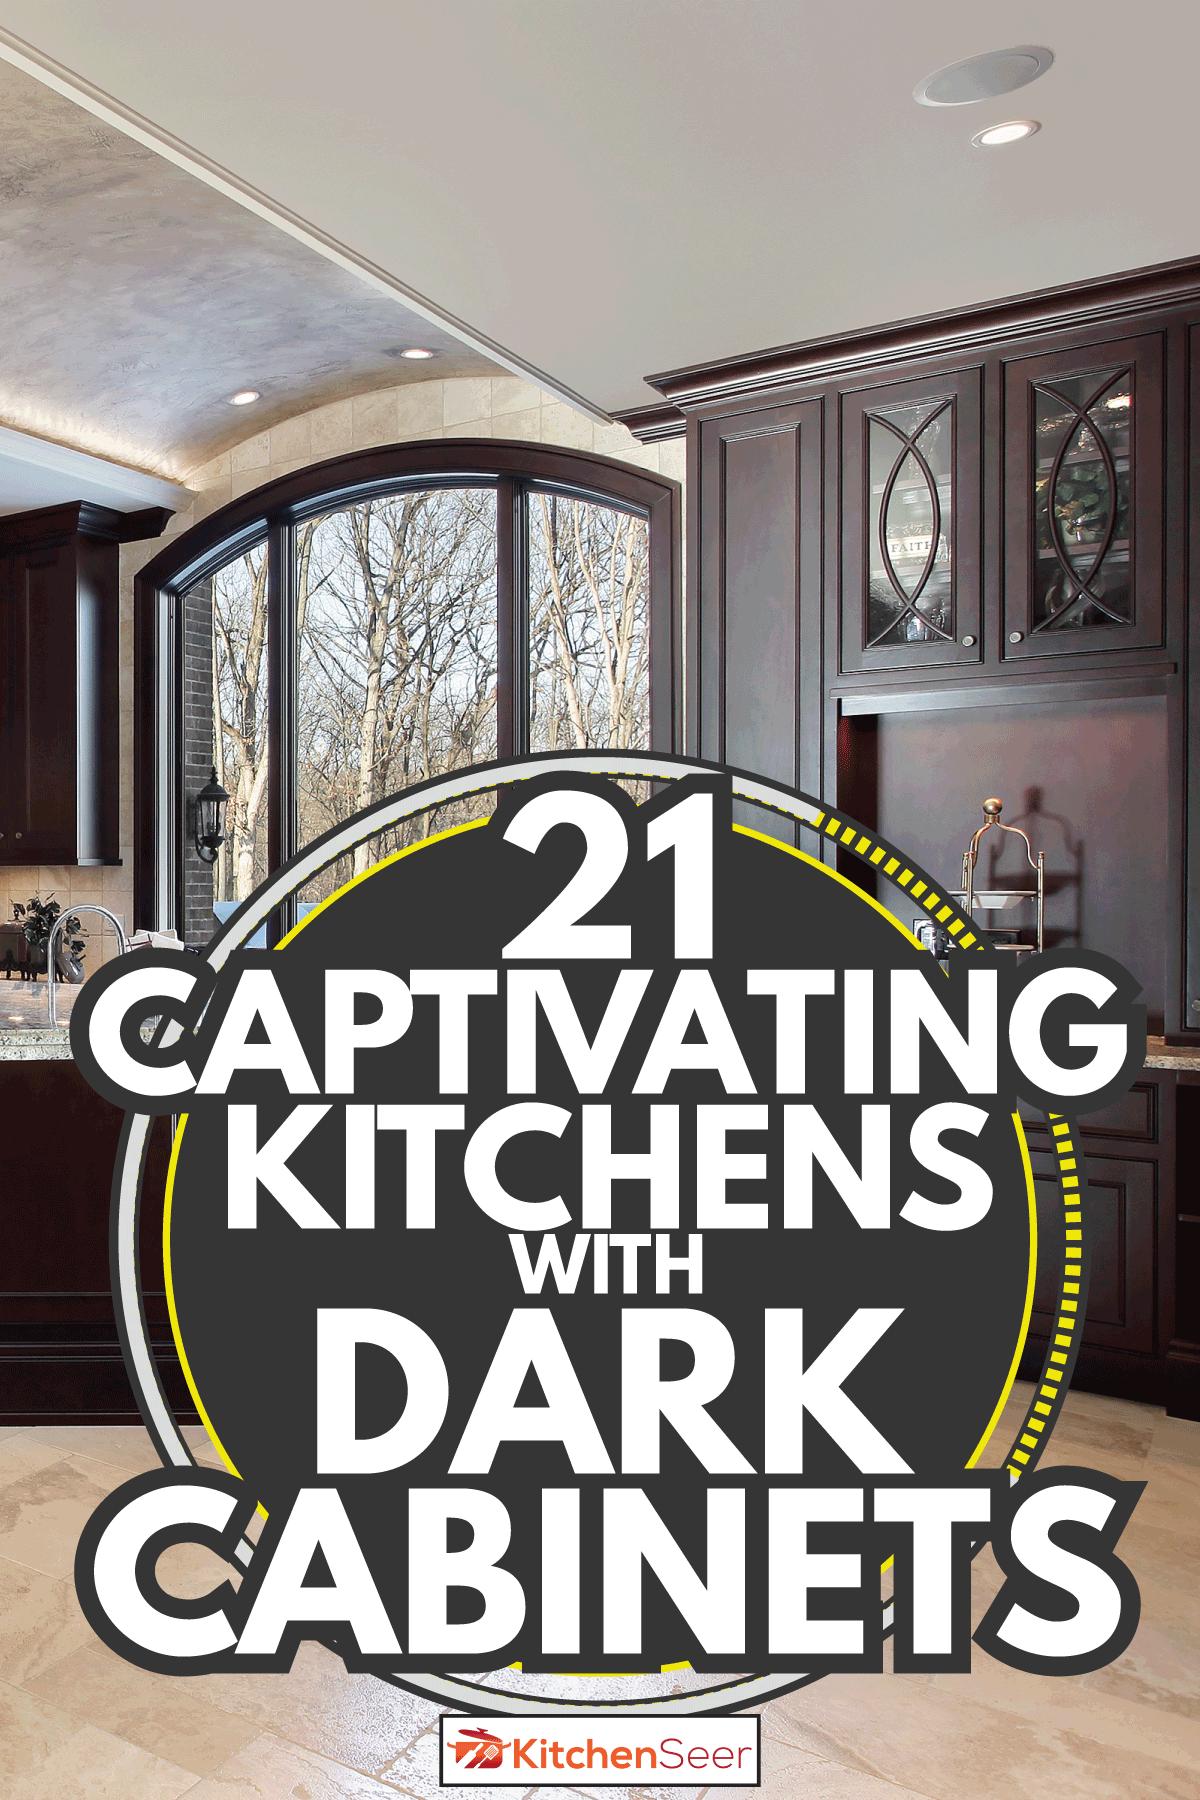 Large kitchen in luxury home with dark wooden cabinets. 21 Captivating Kitchens With Dark Cabinets